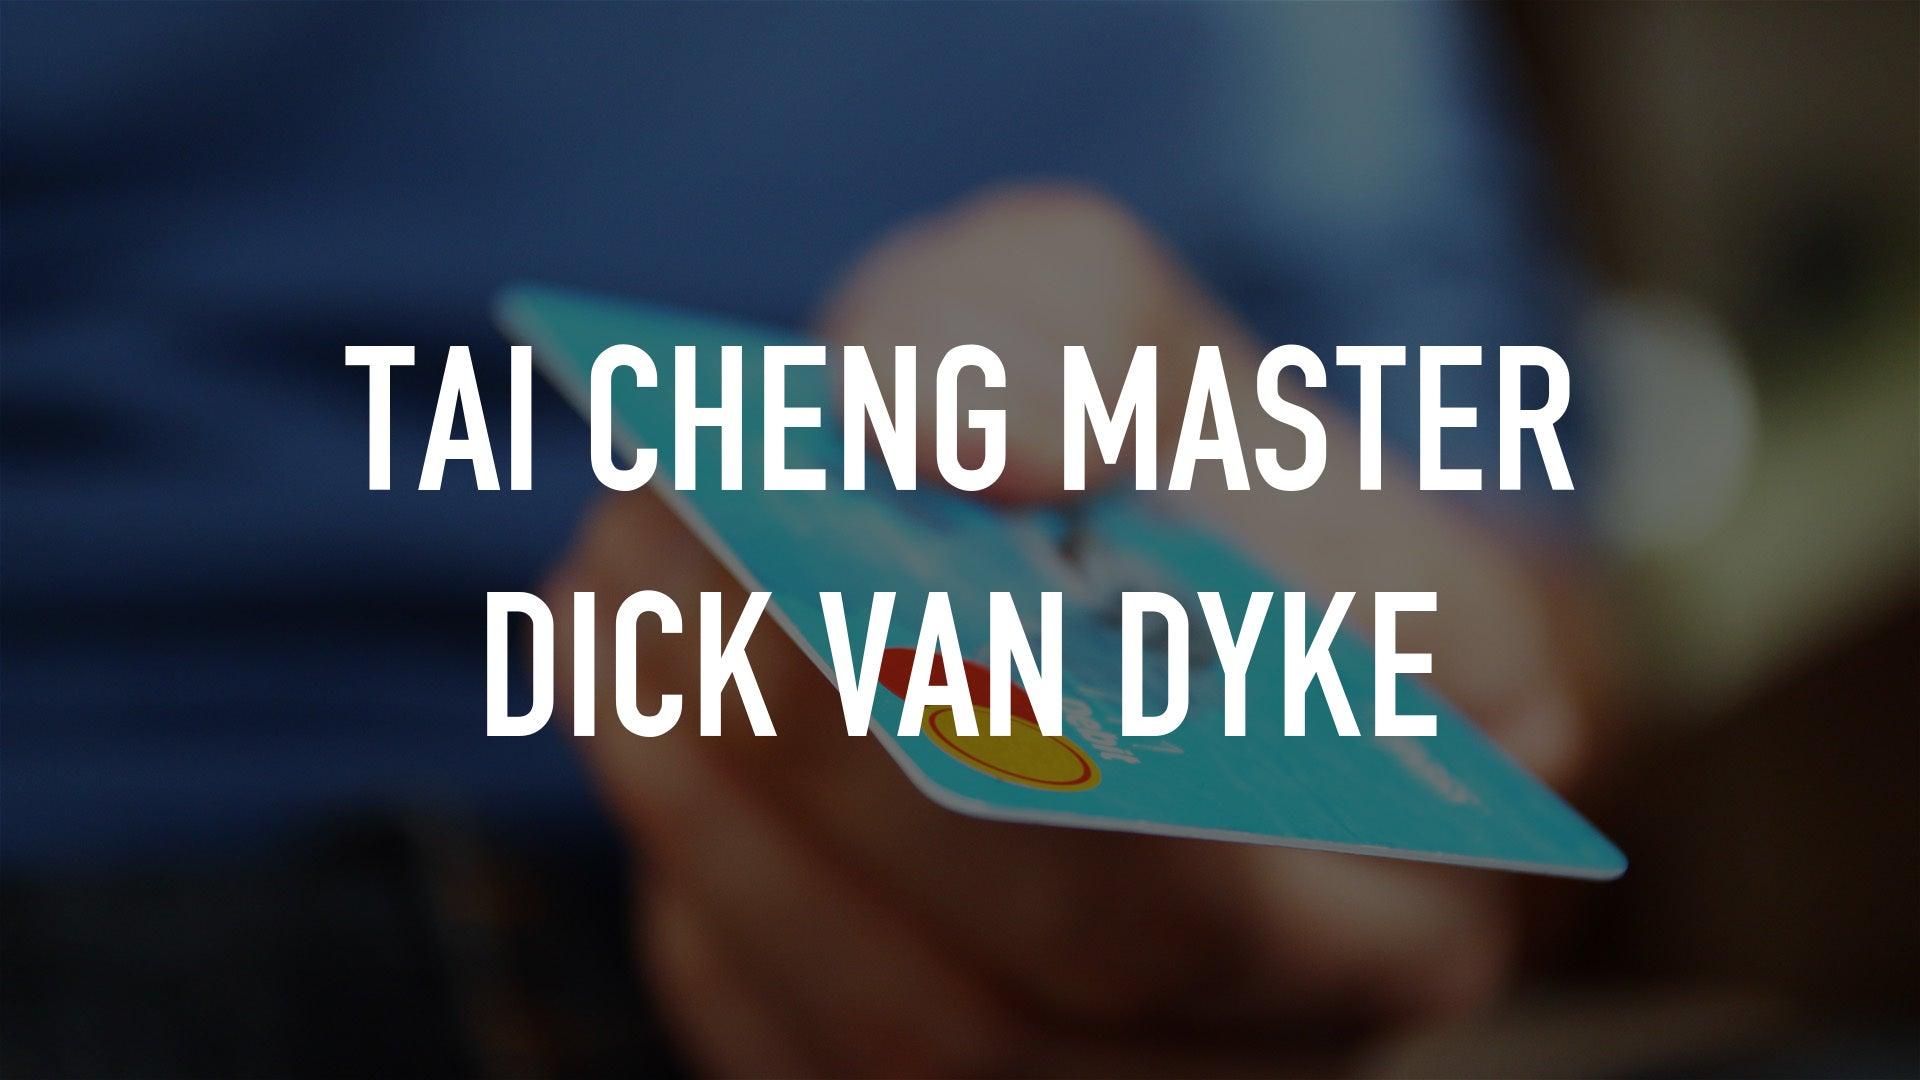 Tai Cheng Master Dick Van Dyke